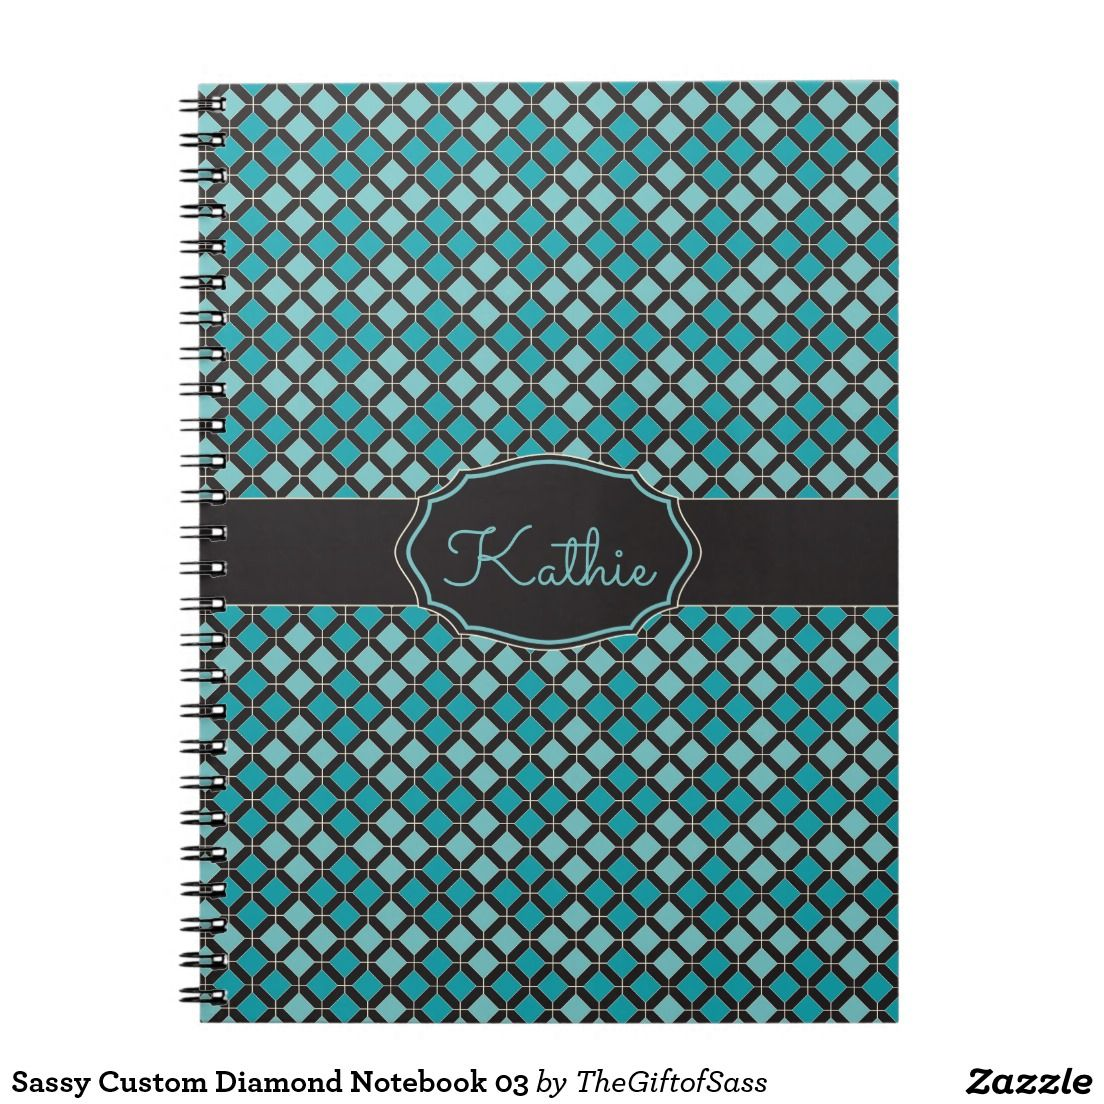 Sassy Custom Diamond Notebook 03